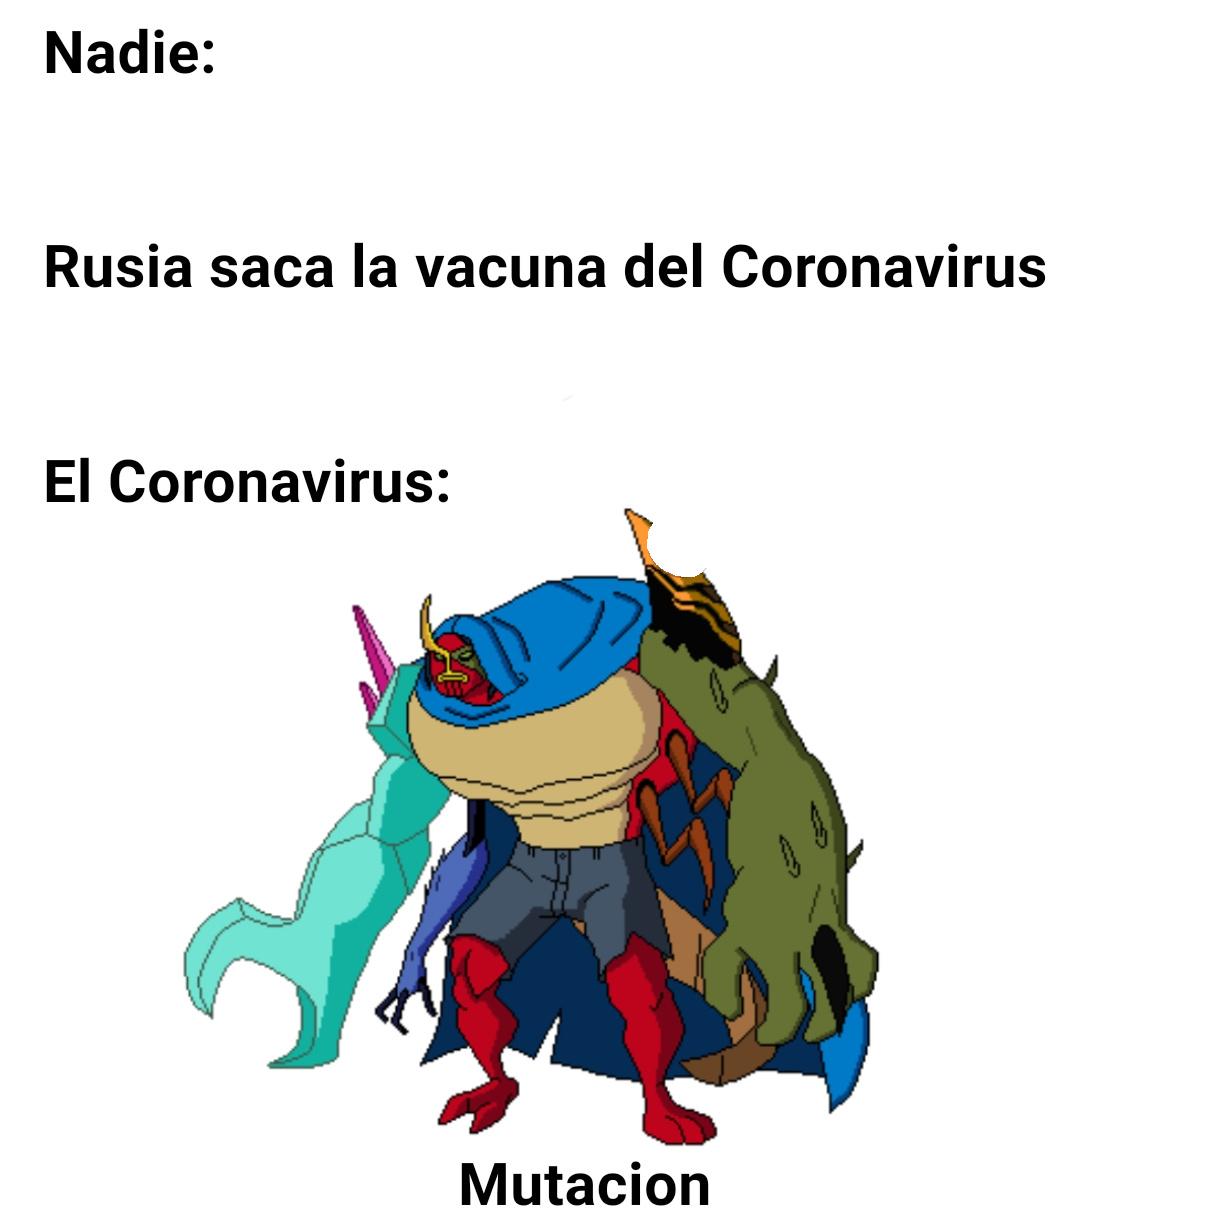 Mutacion ._. - meme